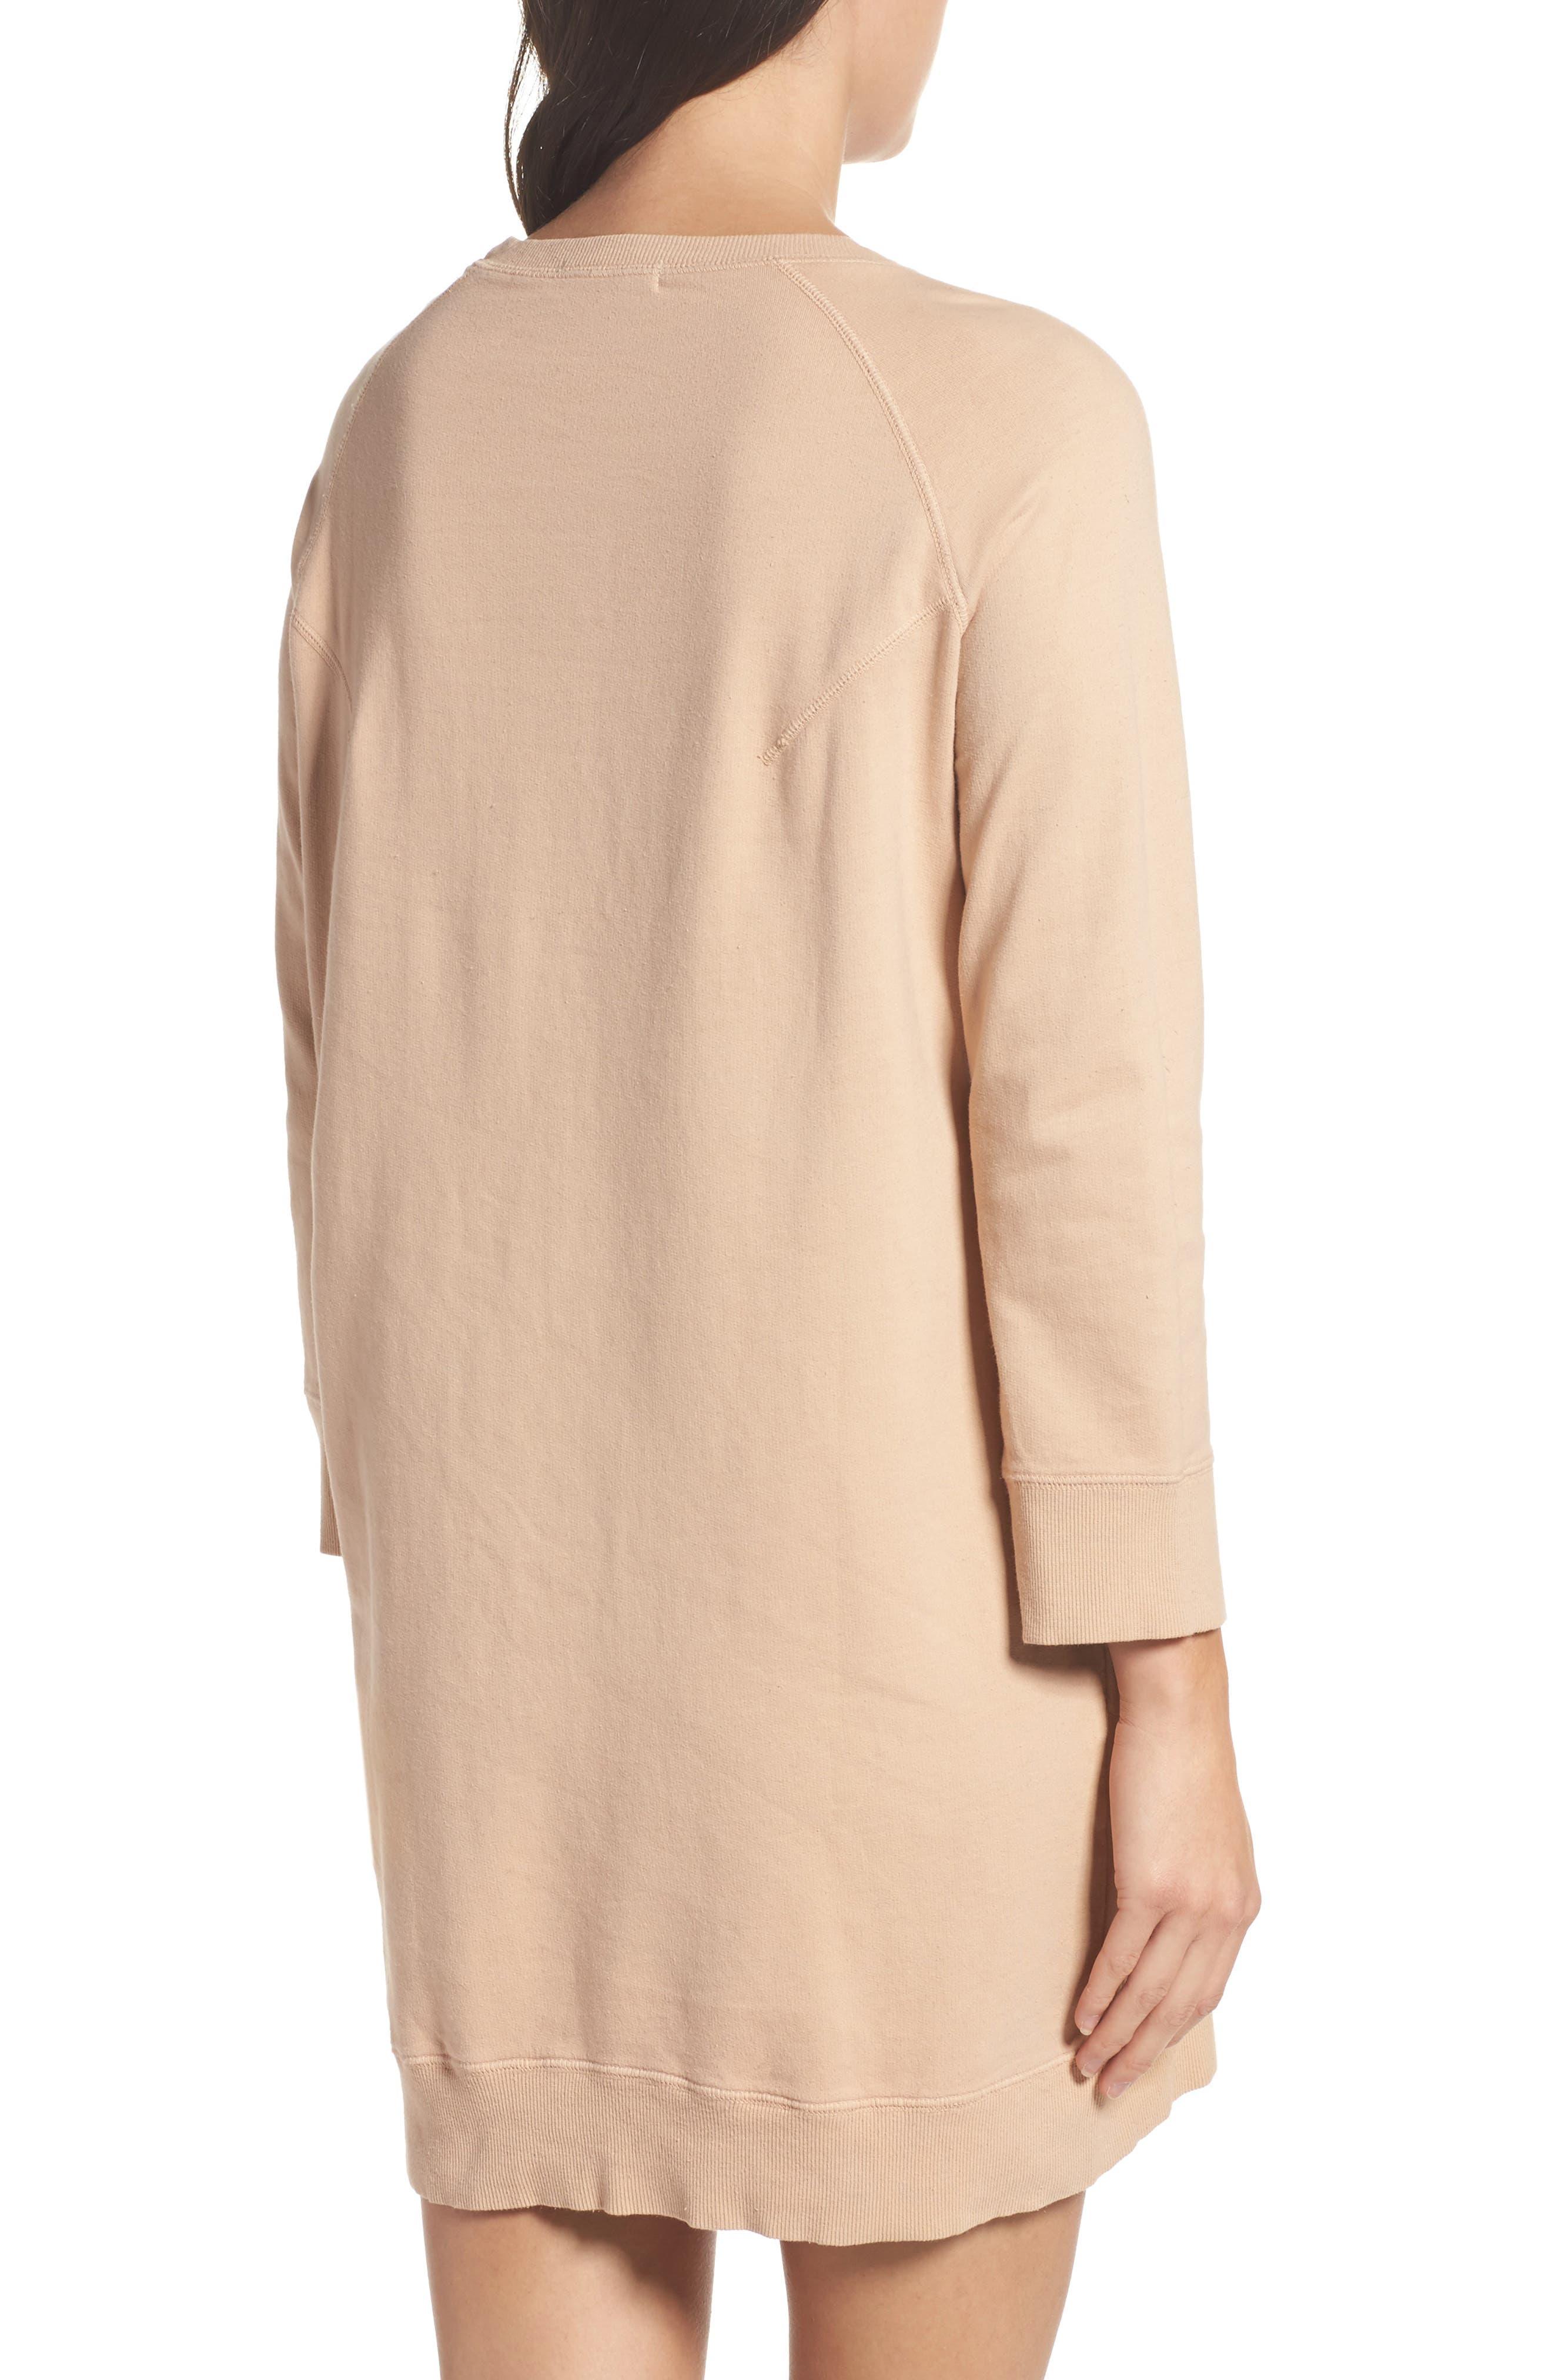 Sweatshirt Dress,                             Alternate thumbnail 2, color,                             950